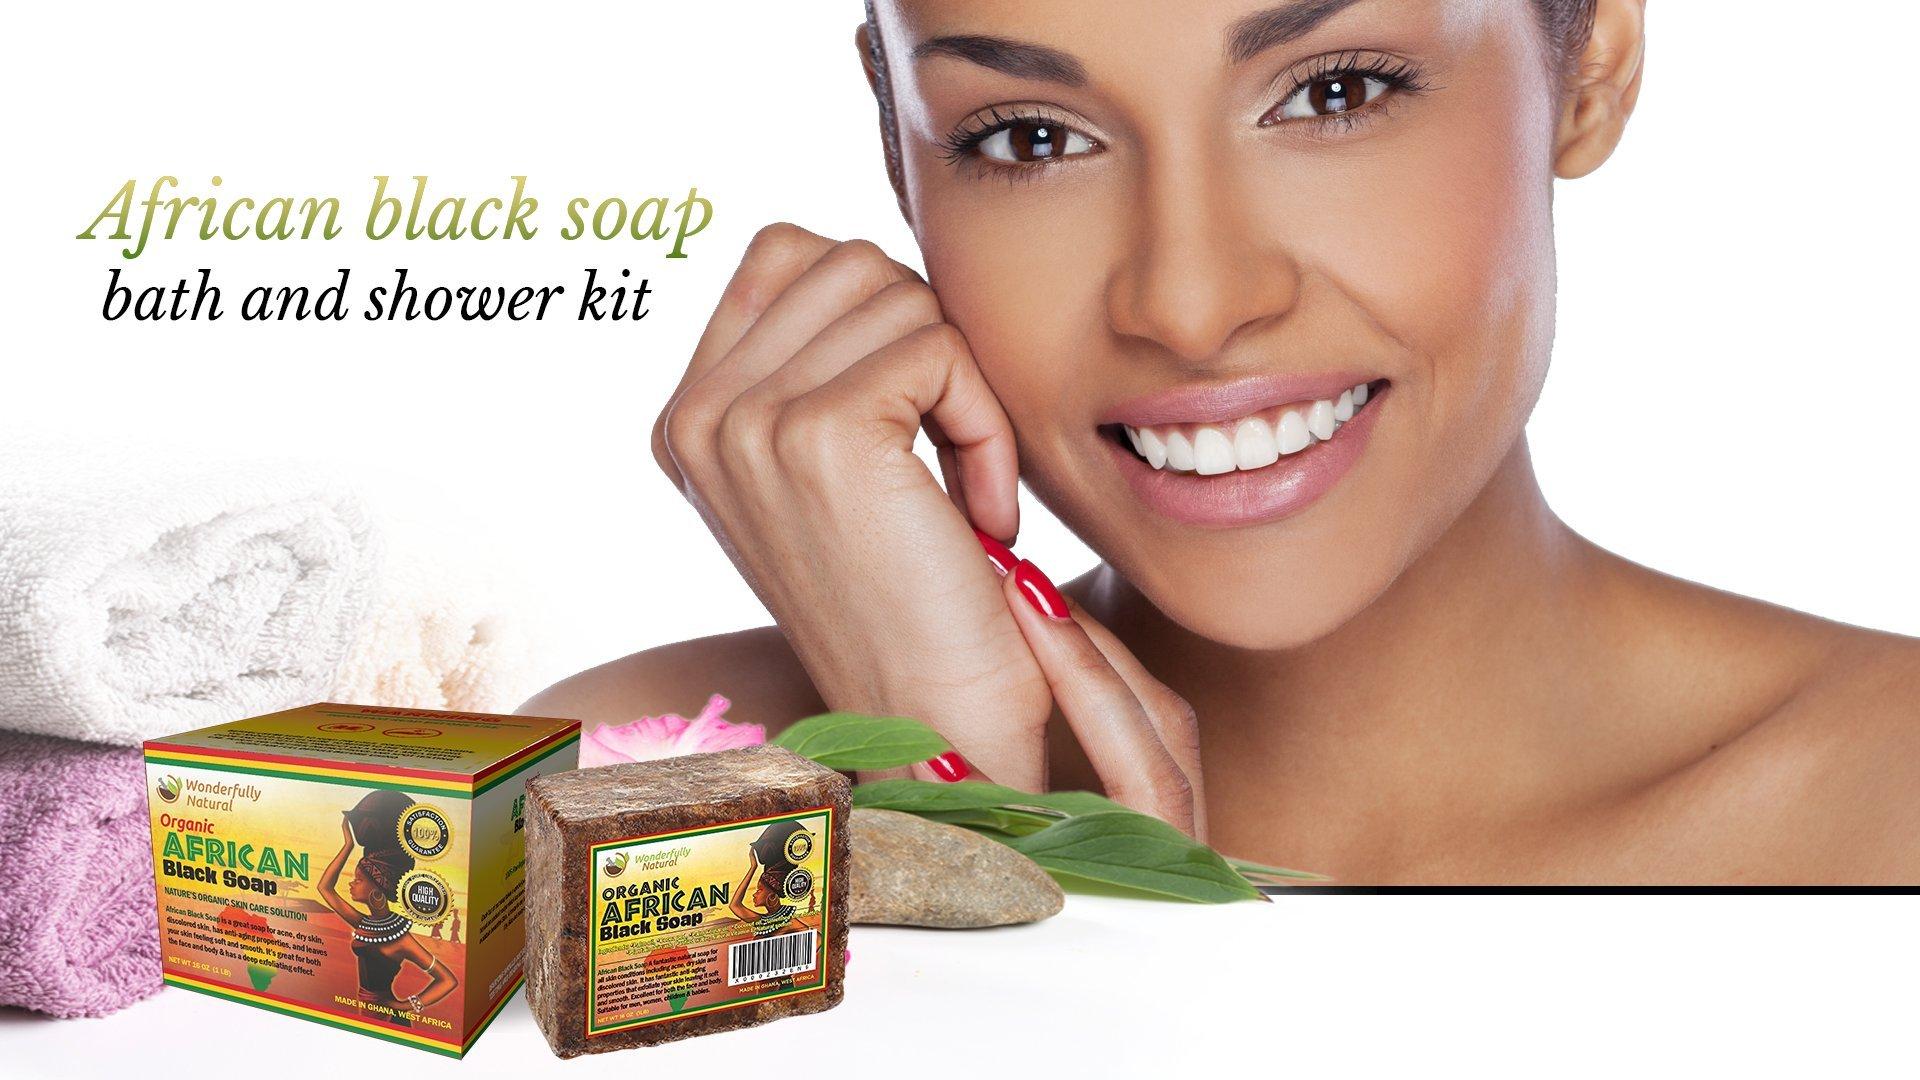 Wonderfully Natural African Black Soap Bar   100% Organic 1lb   Black soap Acne Treatment   Eczema Natural Soap   60 day Satisfaction Guarantee by Wonderfully Natural (Image #7)